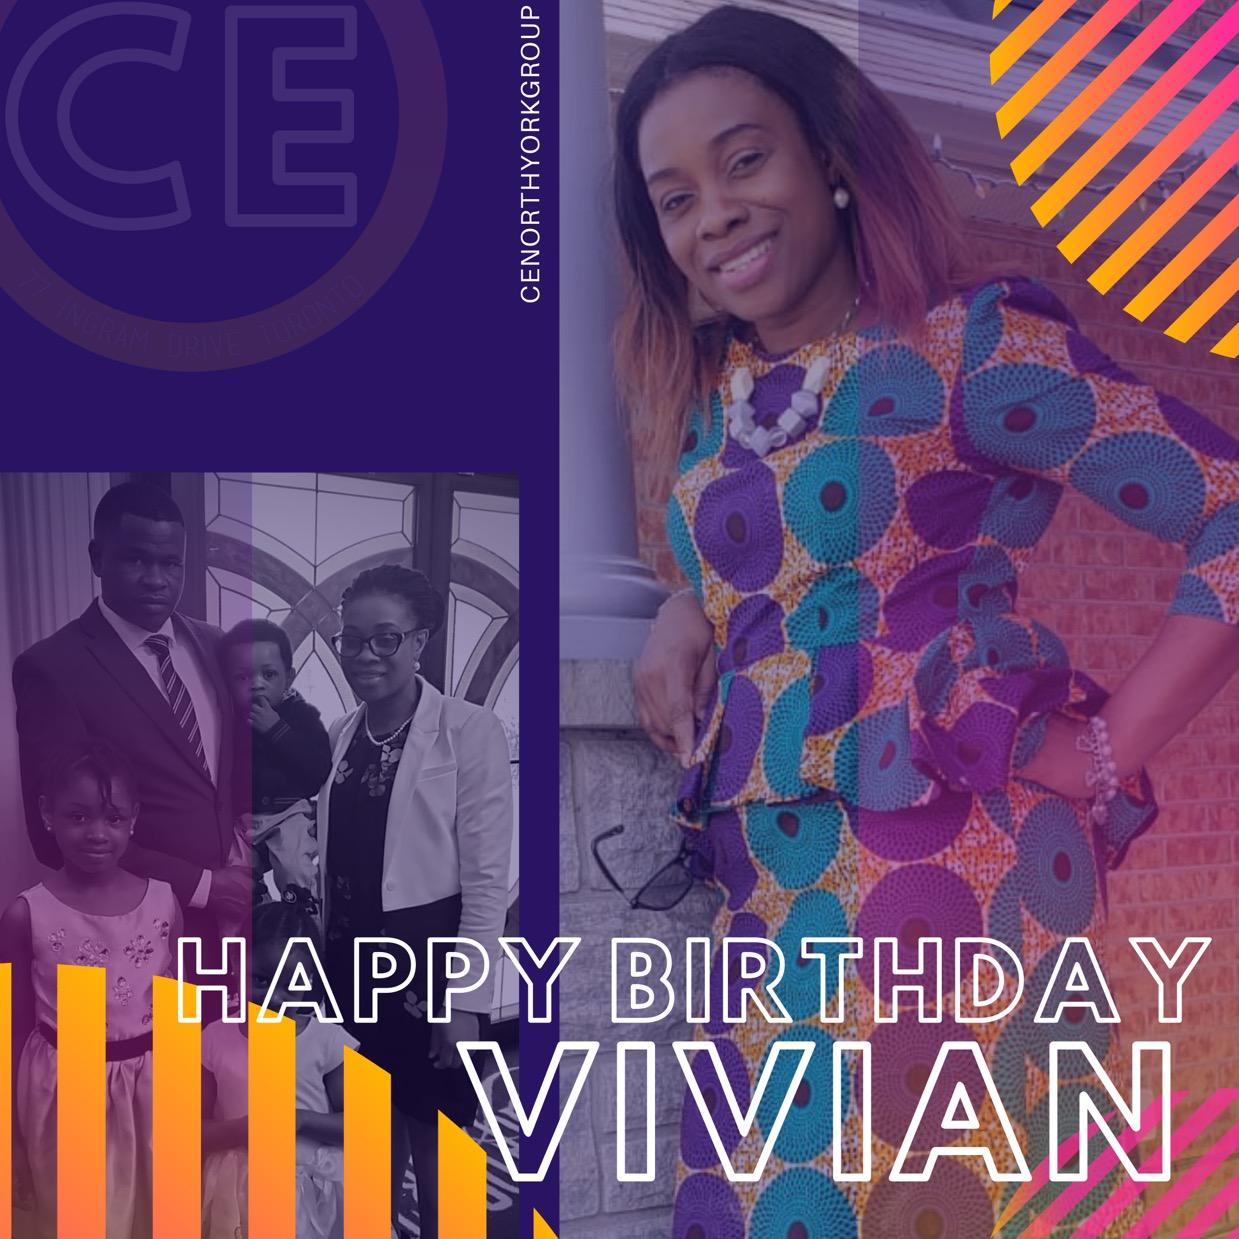 Happy Birthday Dearest Sis Vivian!